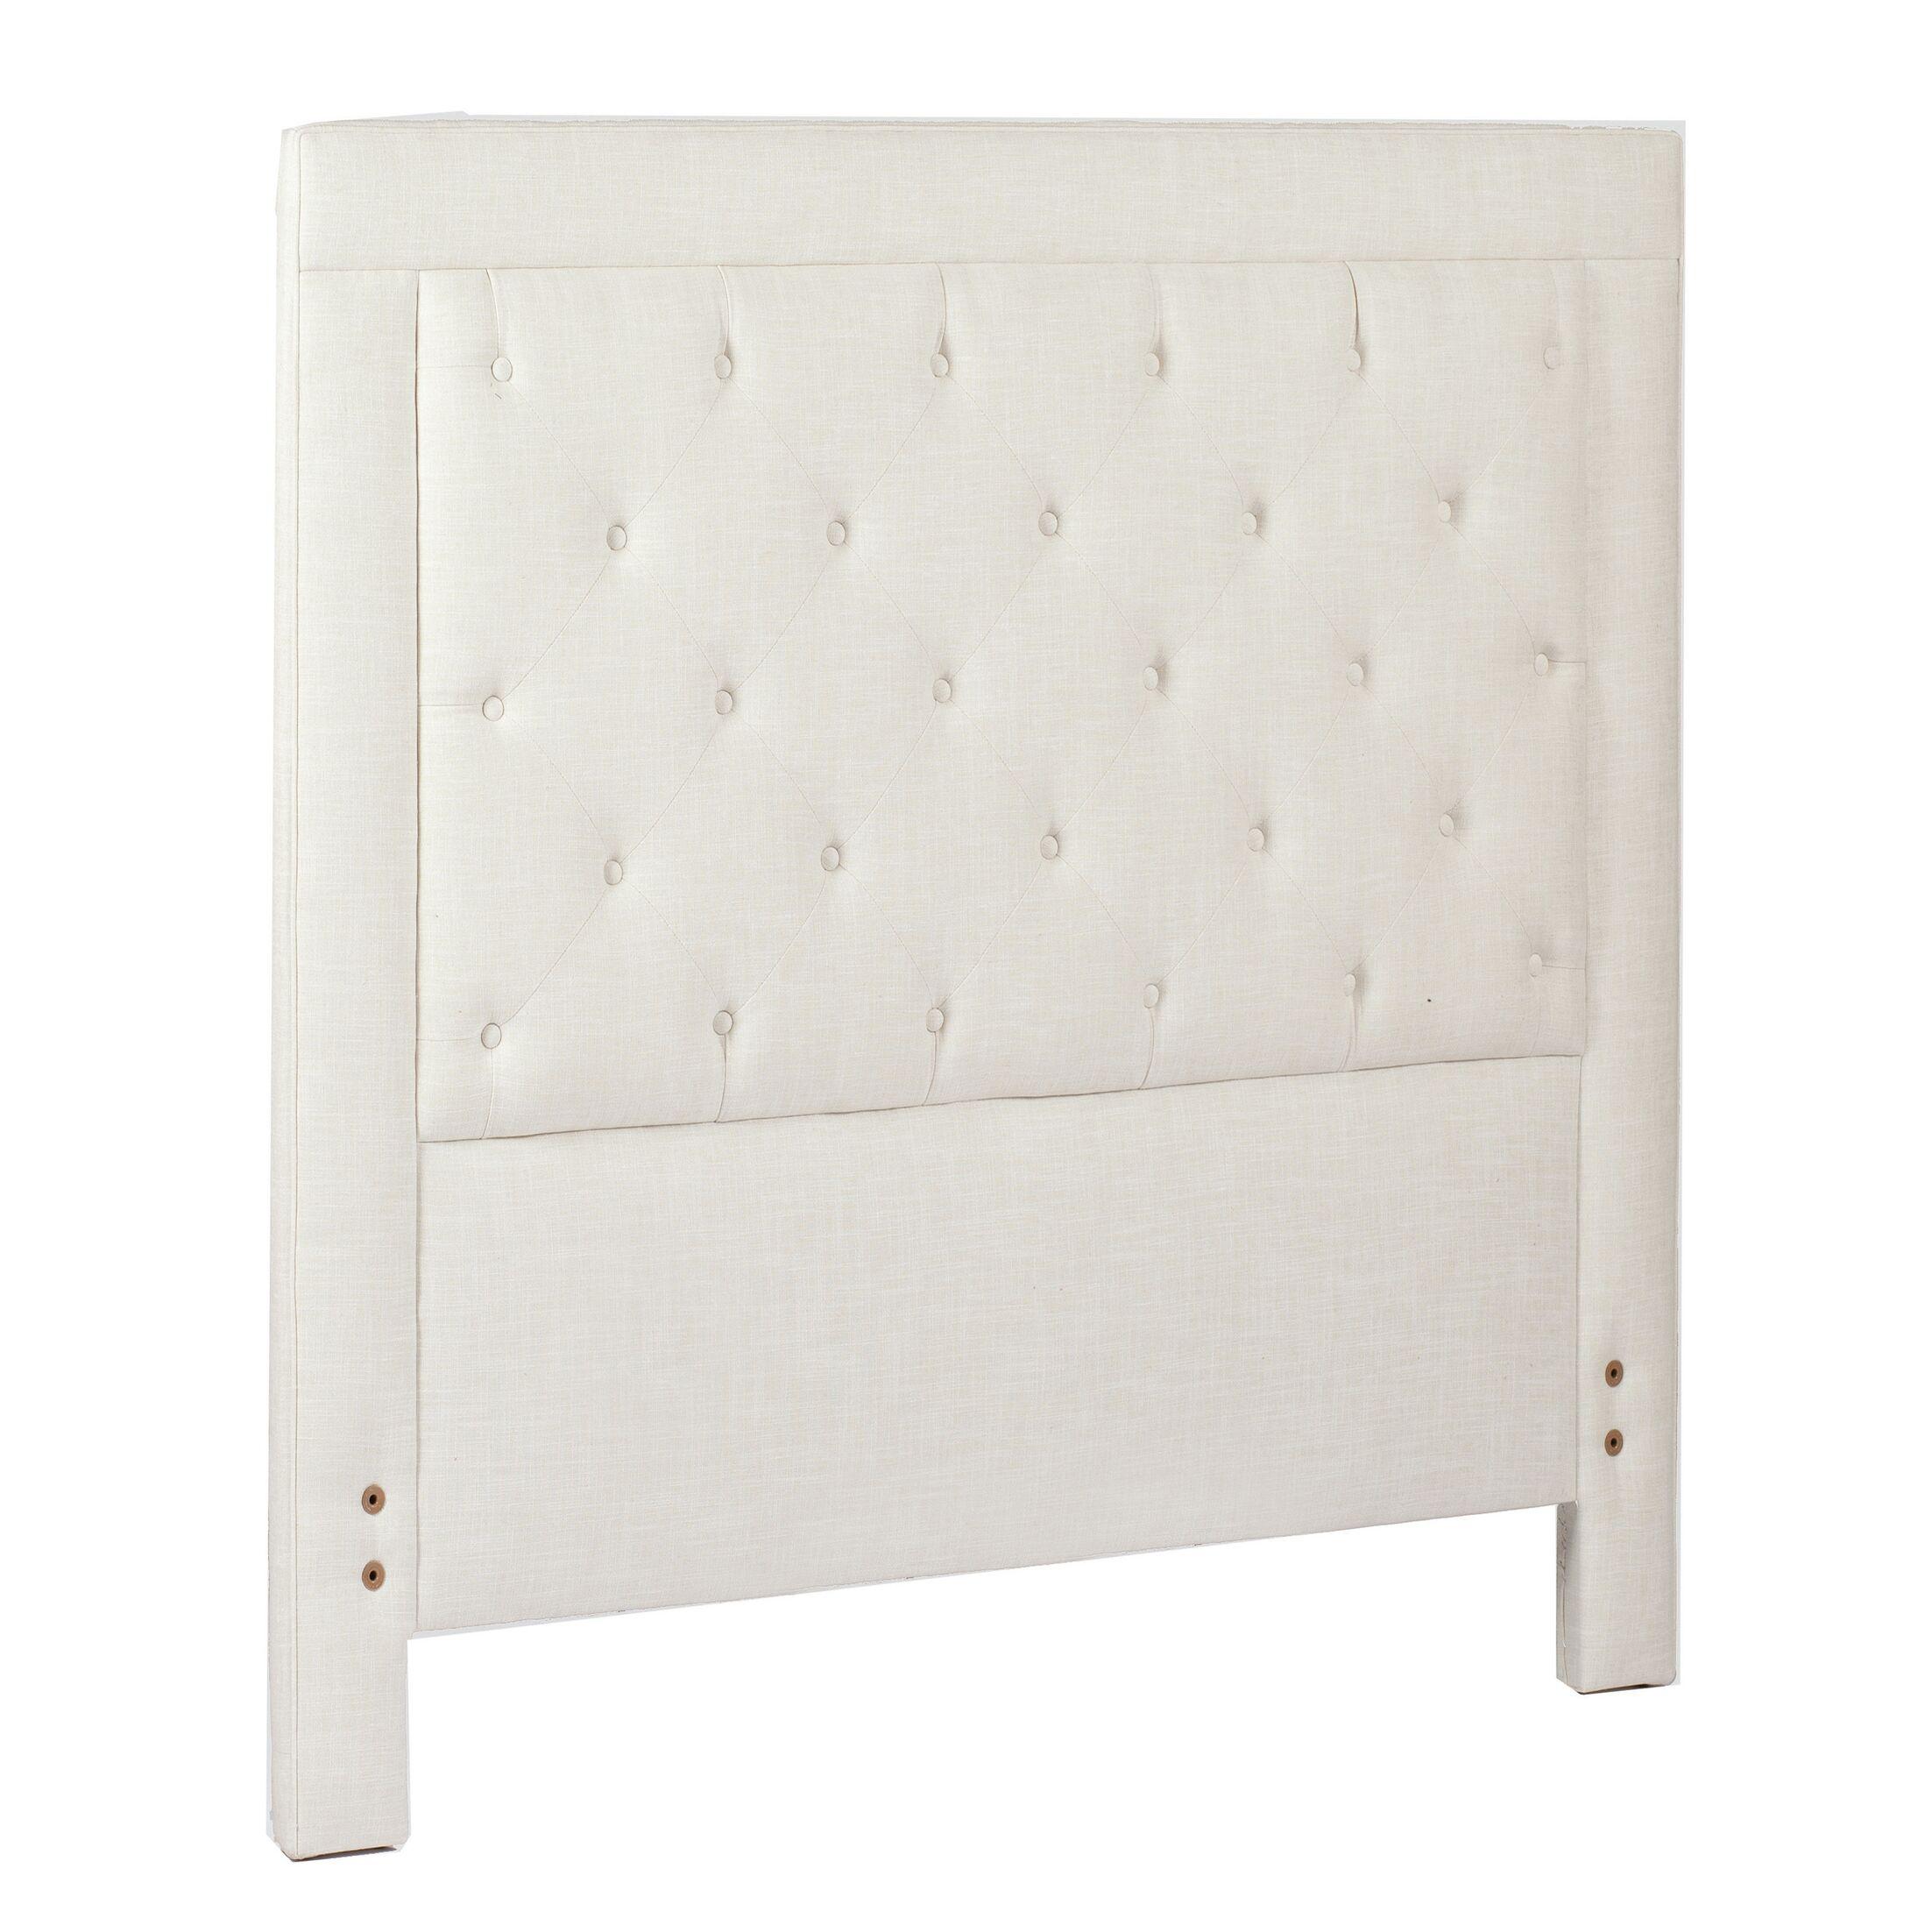 Darcy Upholstered Panel Headboard Size: King, Upholstery: Zulu Vanilla